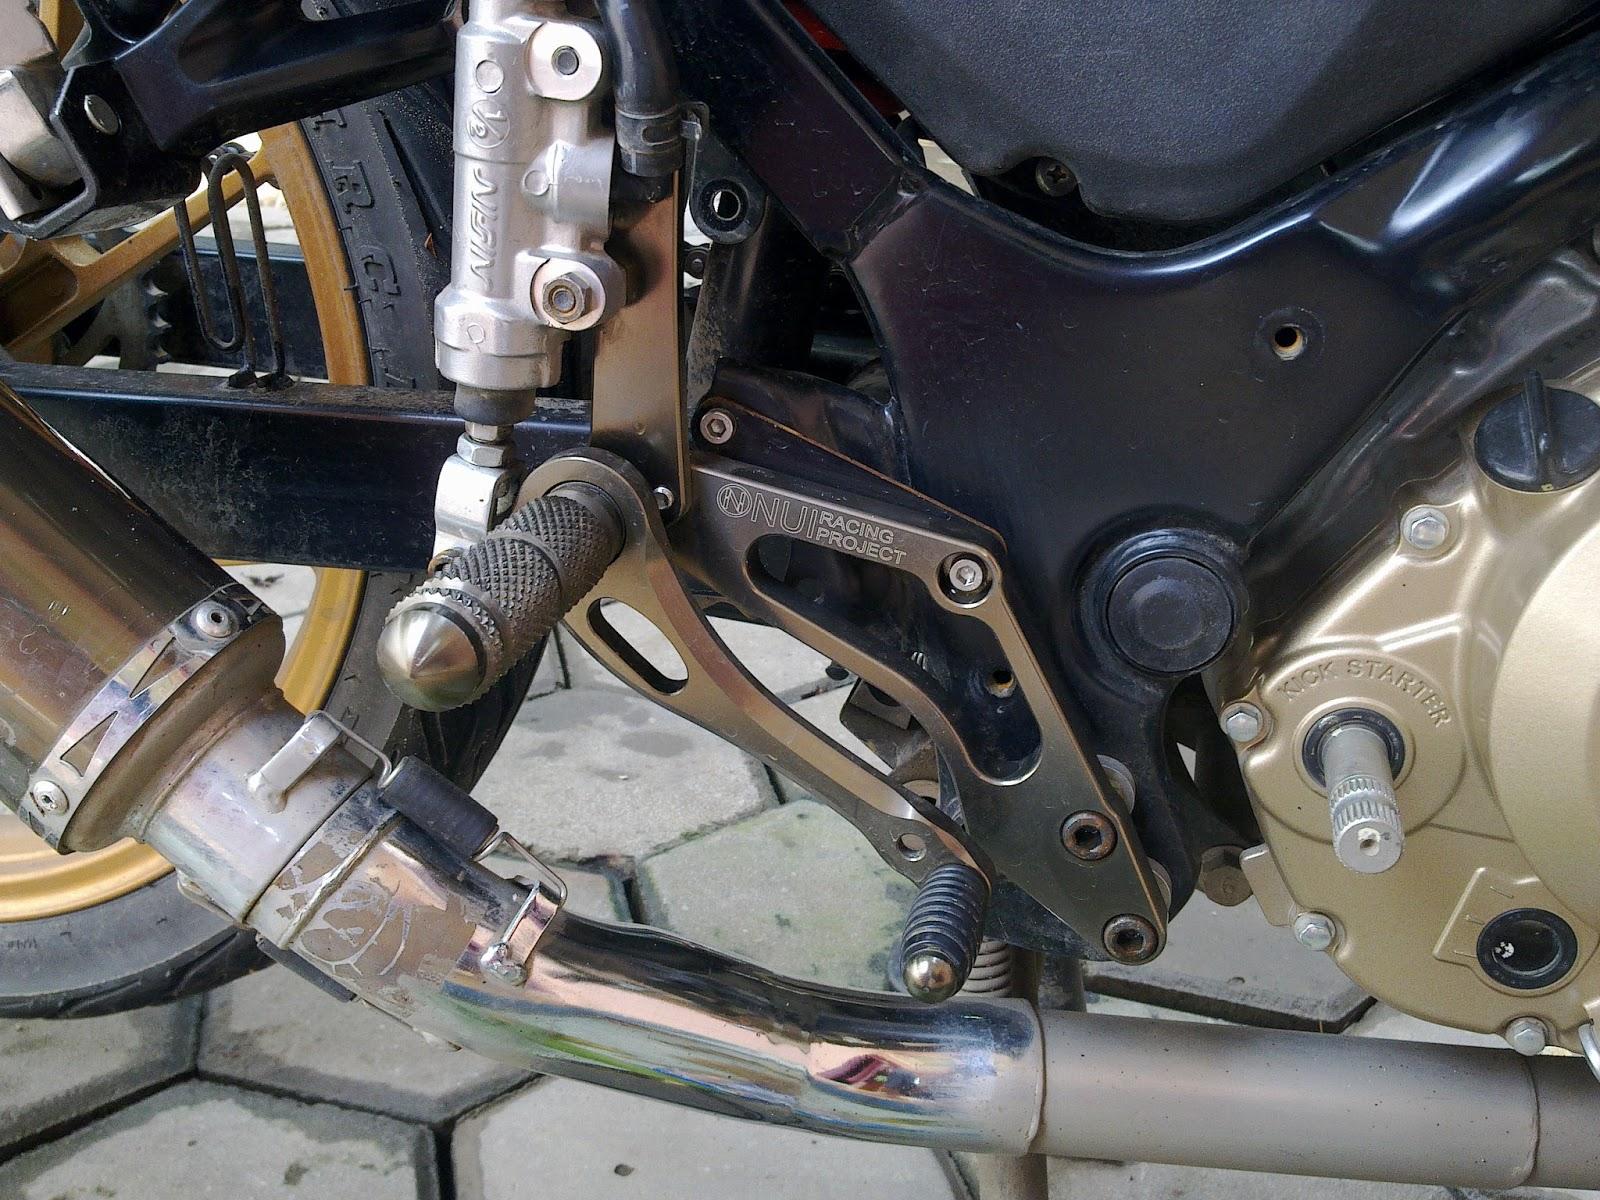 dari samping kanan, pedal rem dah diganti pake underbond NUI Racing  title=